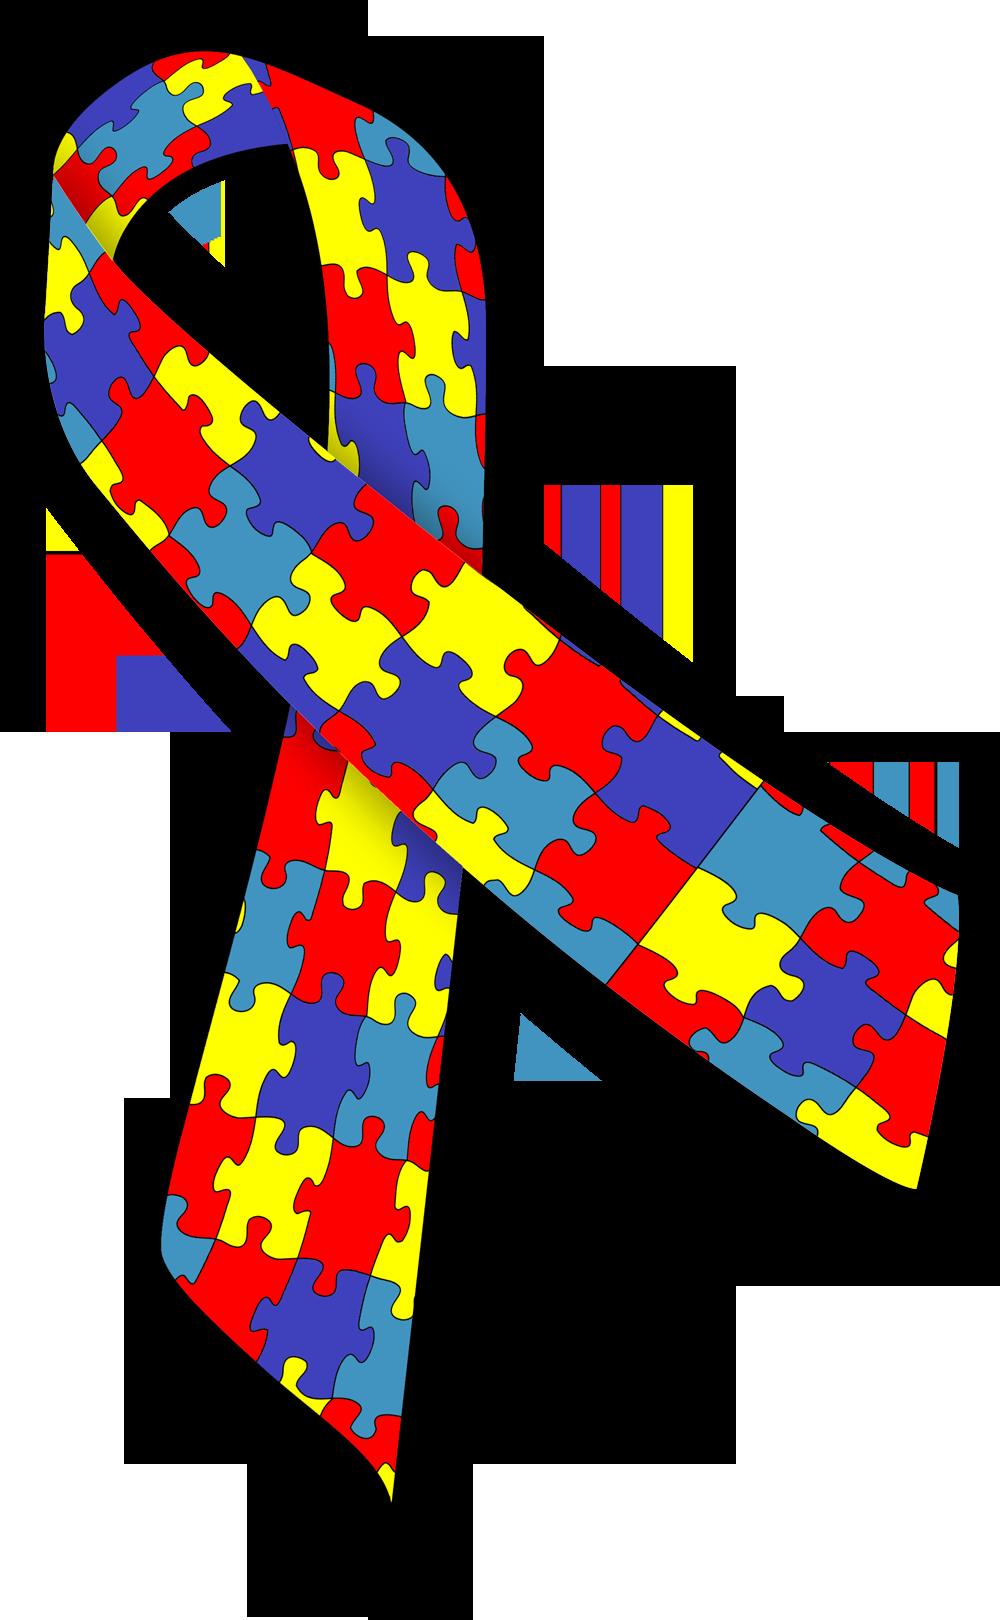 Autism Ribbon Png & Free Autism Ribbon.png Transparent.